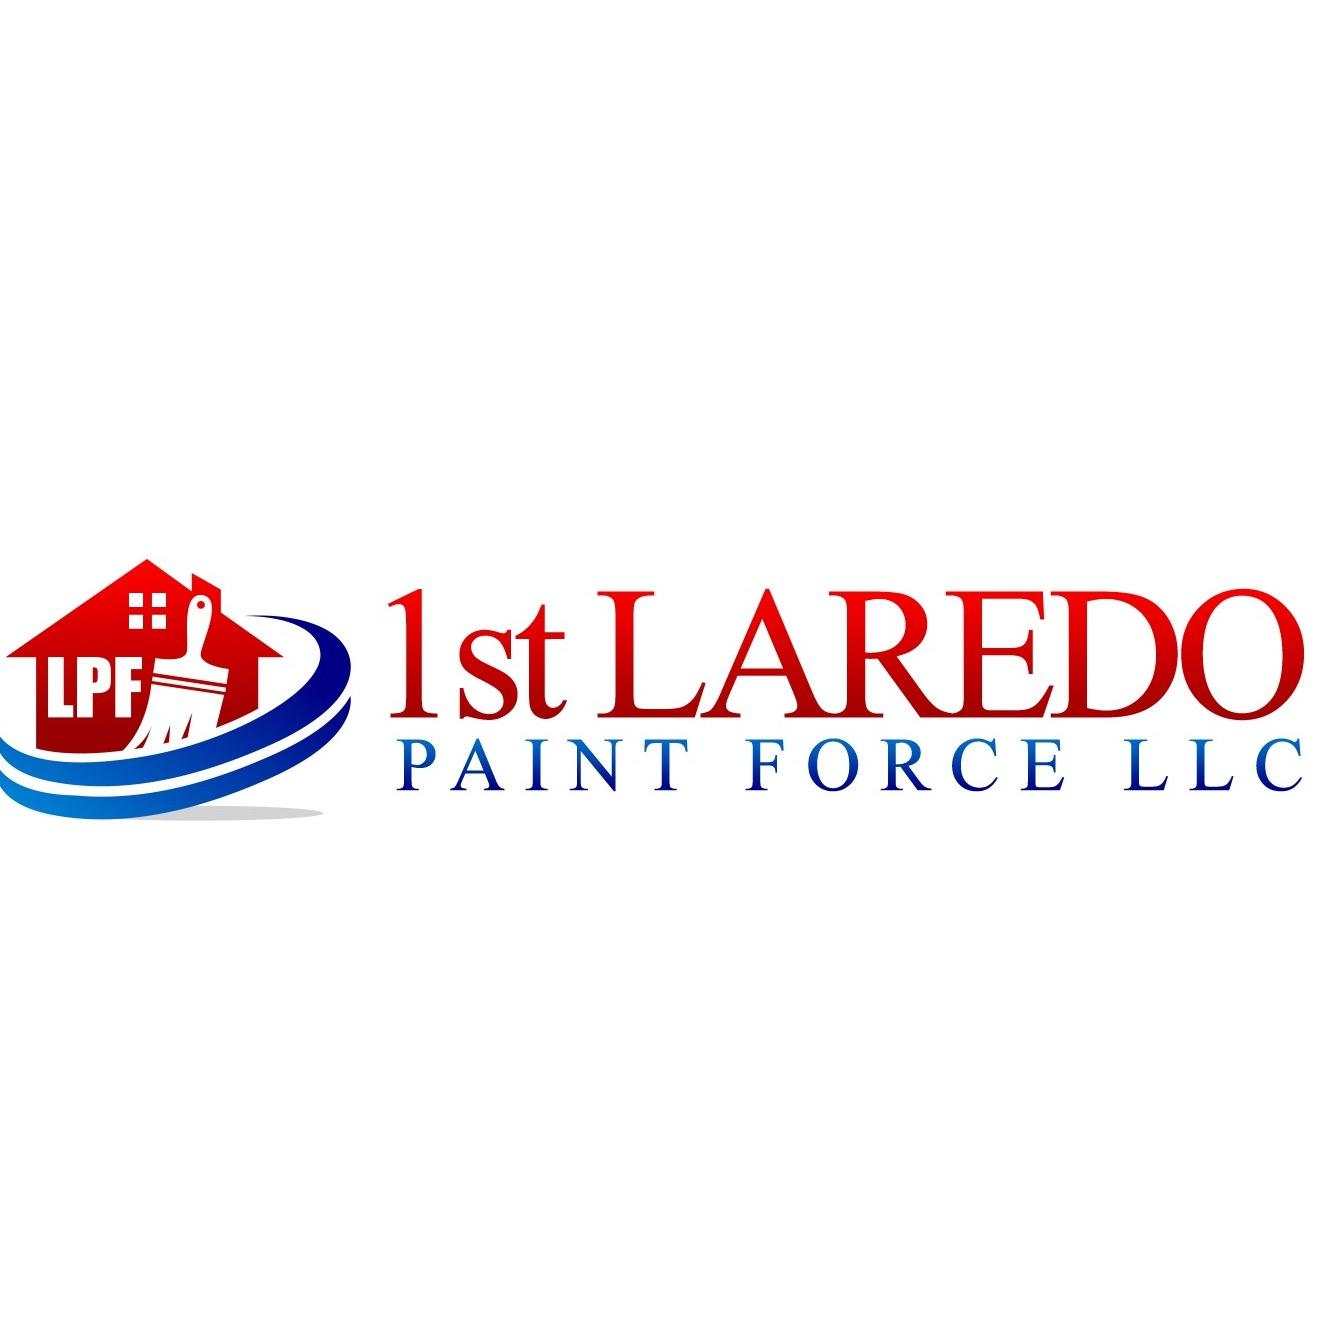 1st Laredo Paint Force, LLC